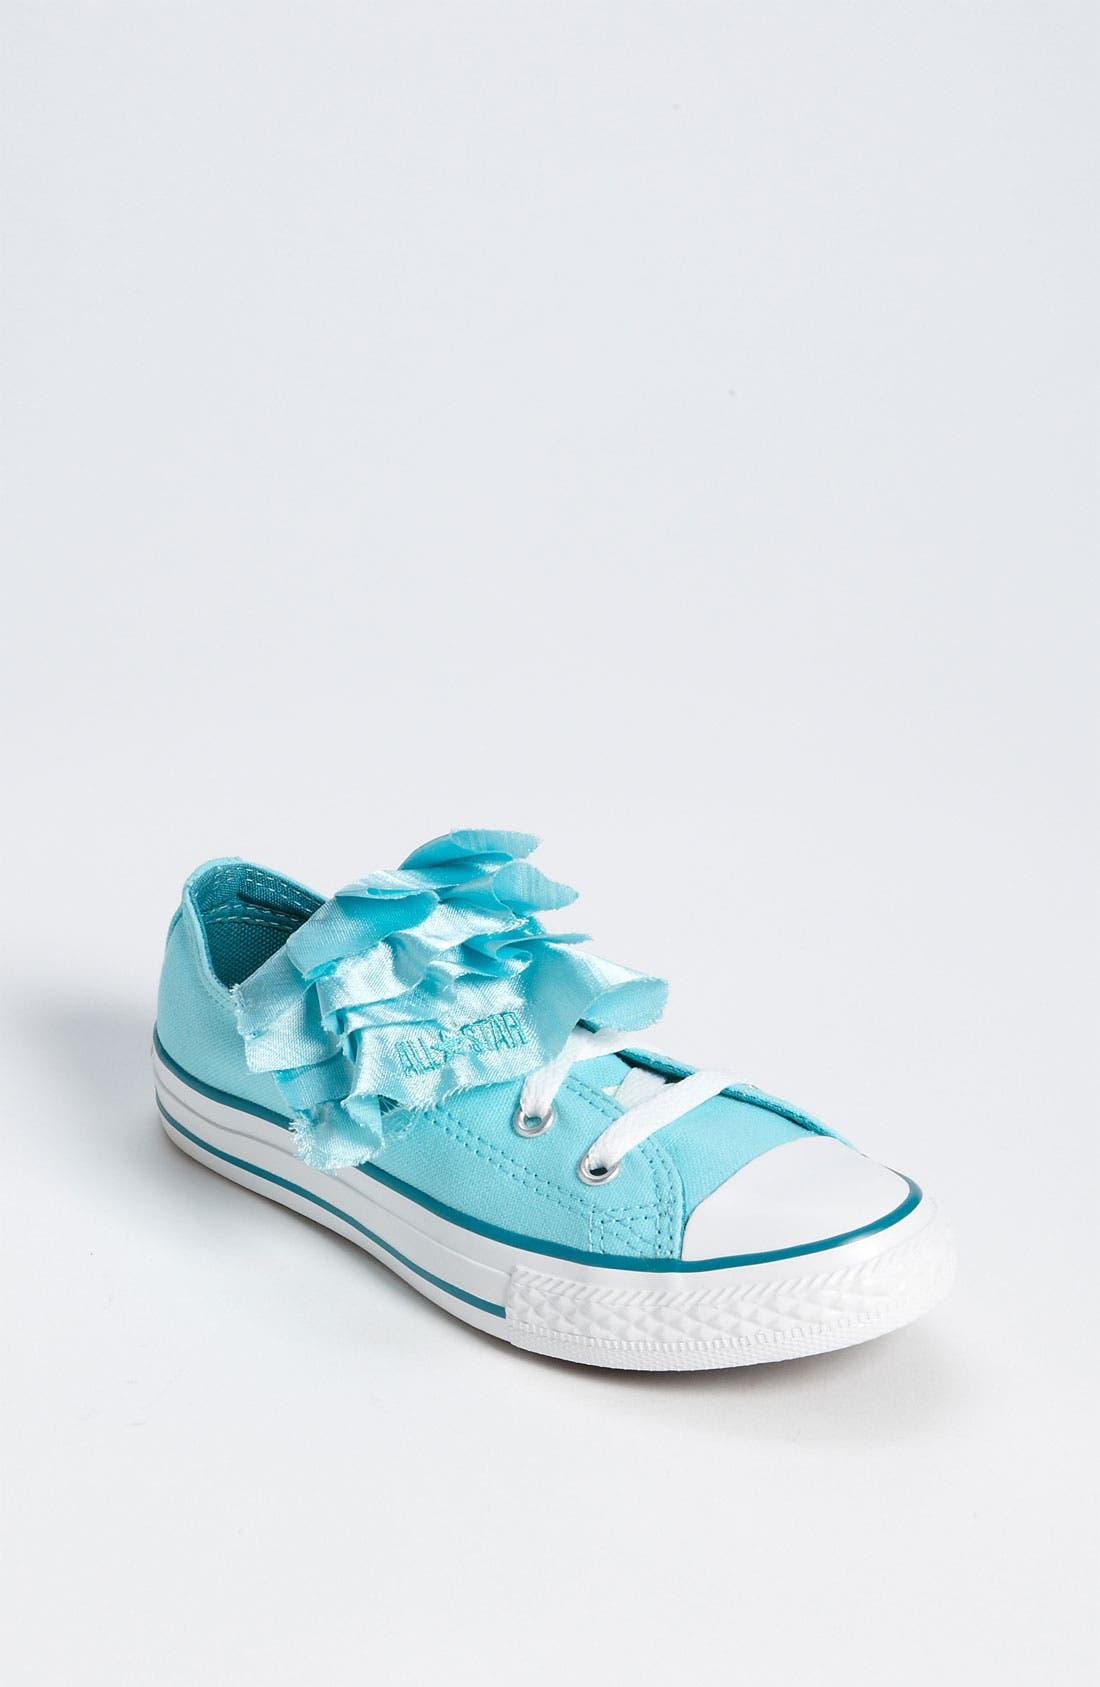 Alternate Image 1 Selected - Converse Chuck Taylor® All Star® 'Mega Tongue' Sneaker (Toddler, Little Kid & Big Kid)